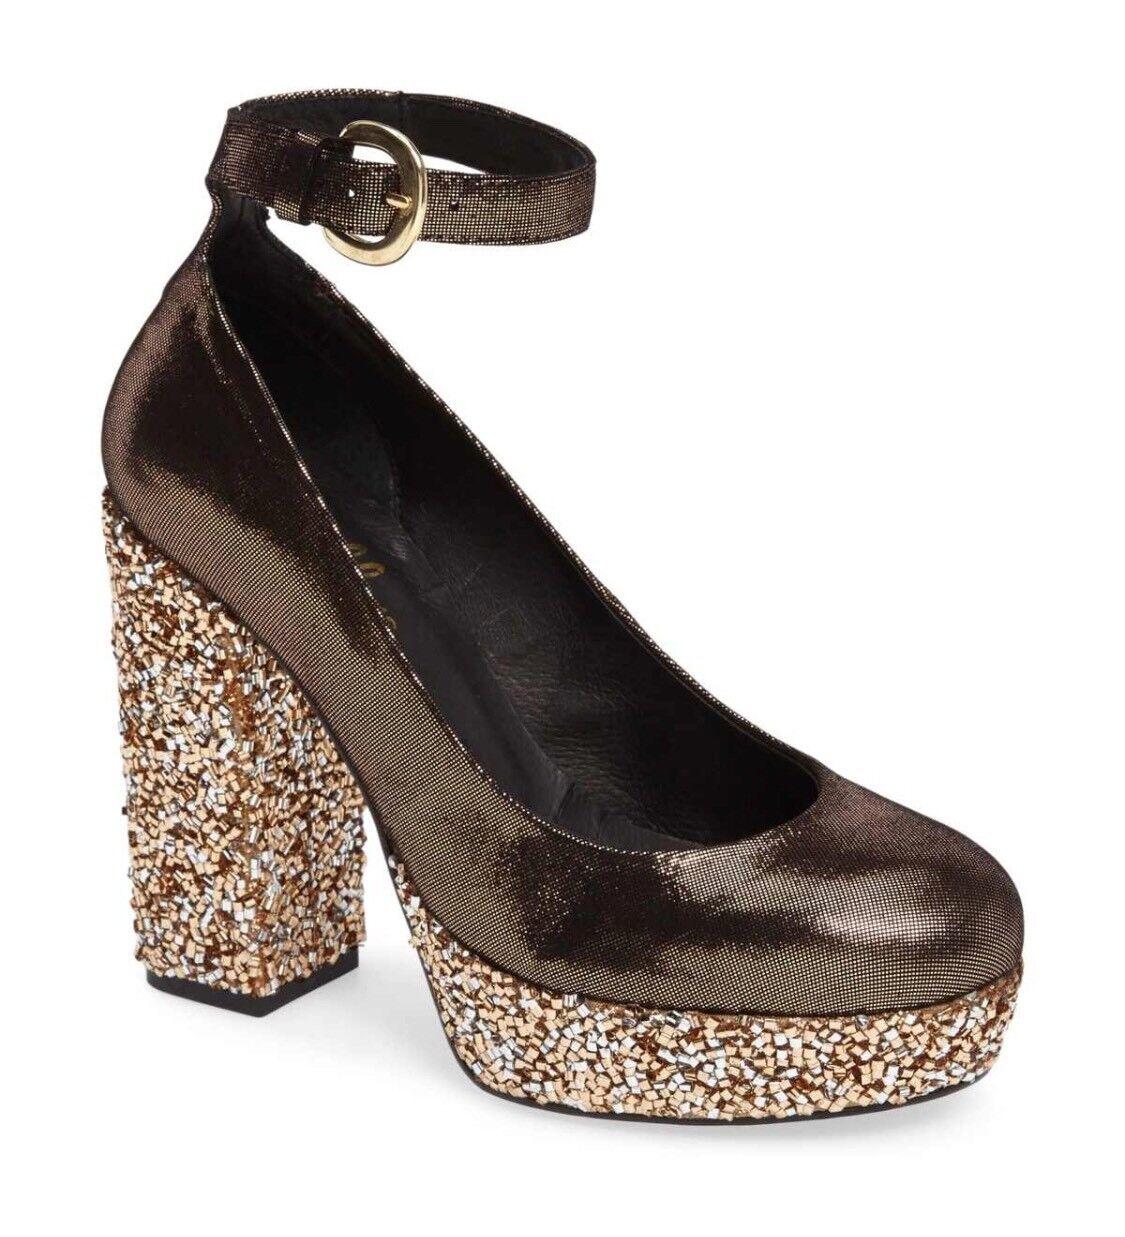 Shellys London Woman Heel Thrift Bronze Glitter Ankle Strap Stack Heel Woman Wedge Platform 3c9270